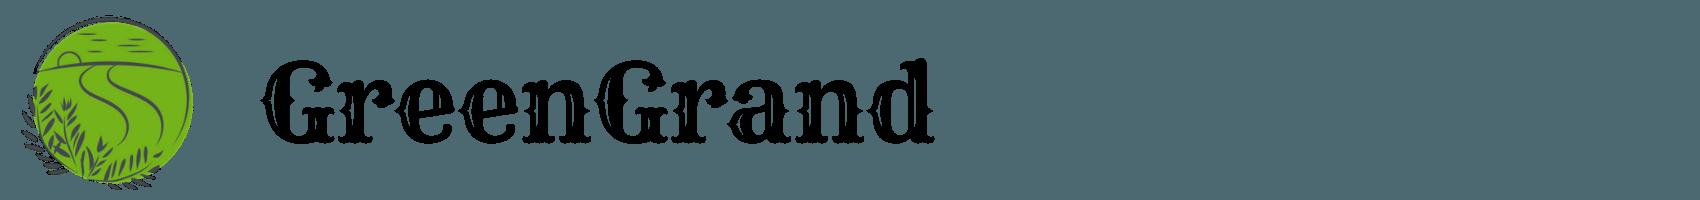 GreenGrand